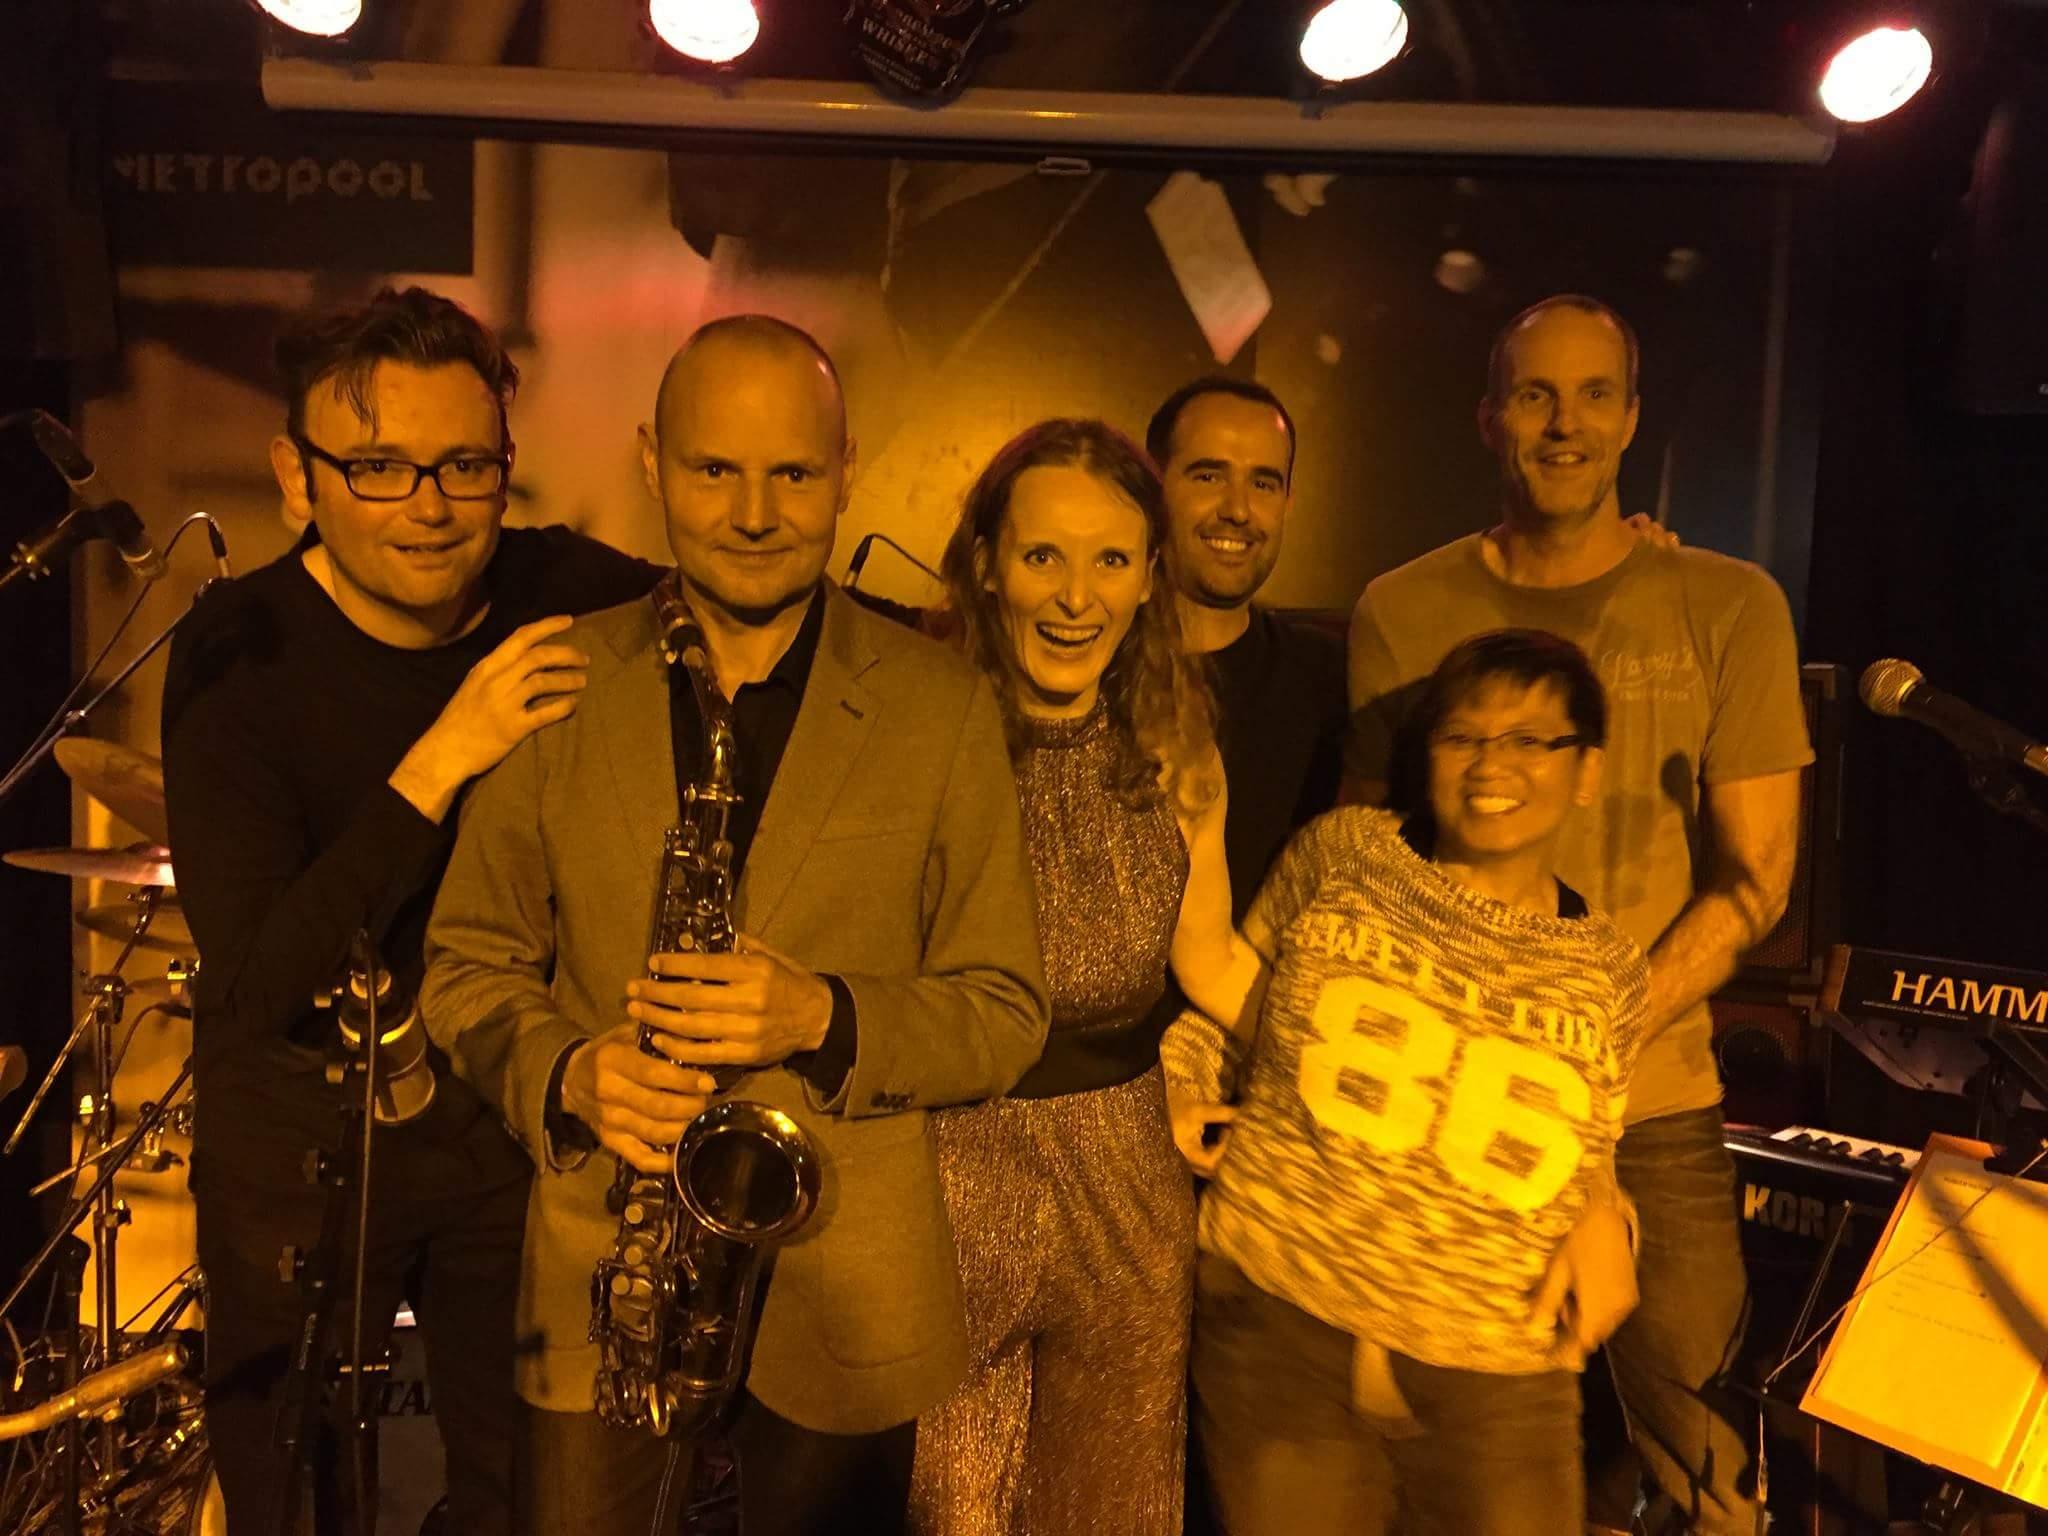 Simone Croes band